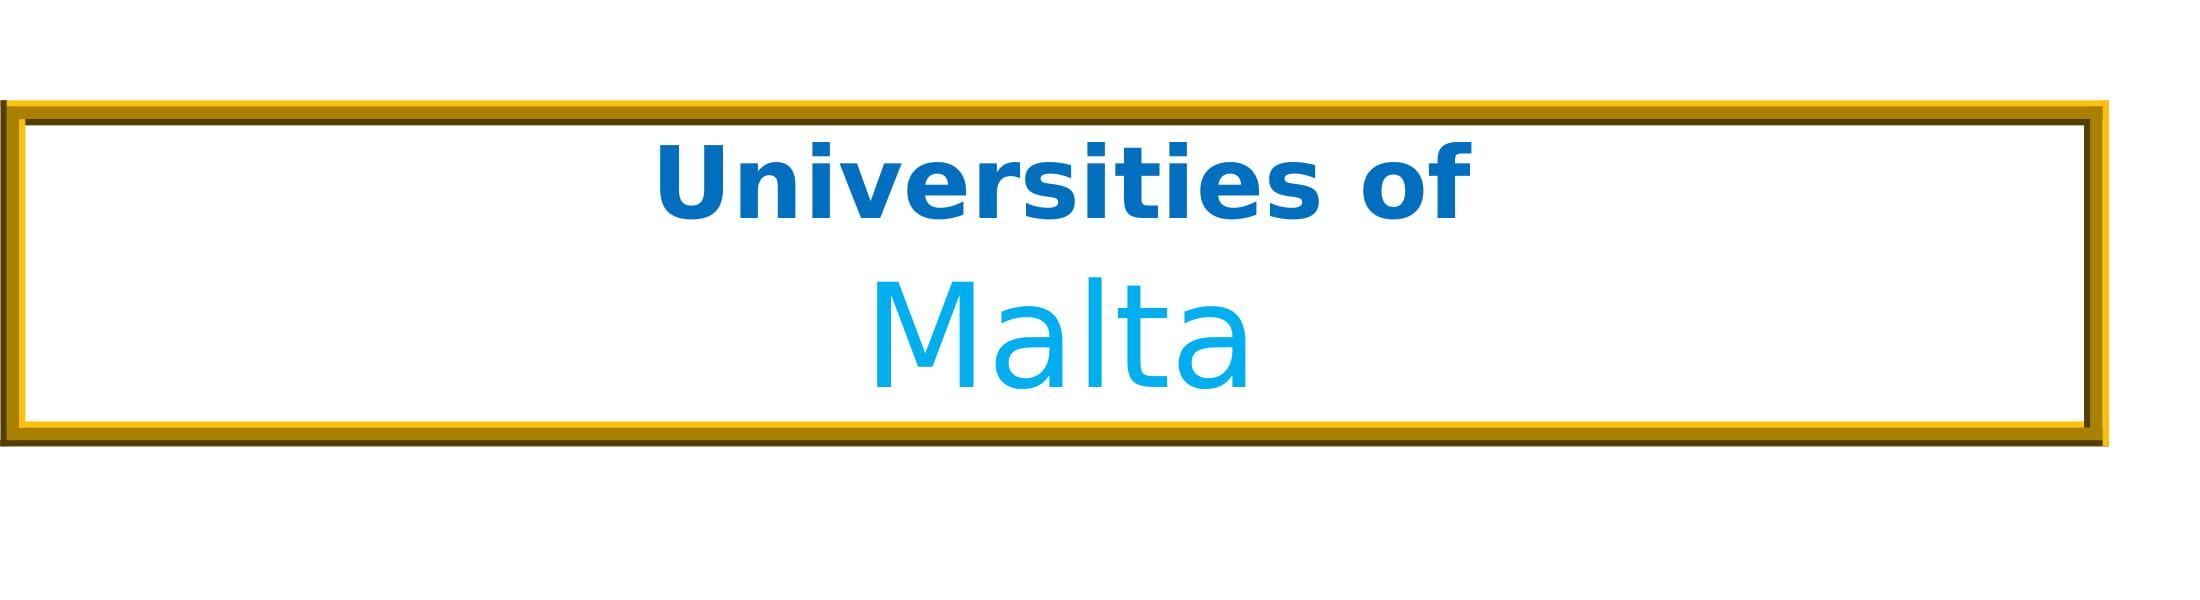 List of Universities in Malta